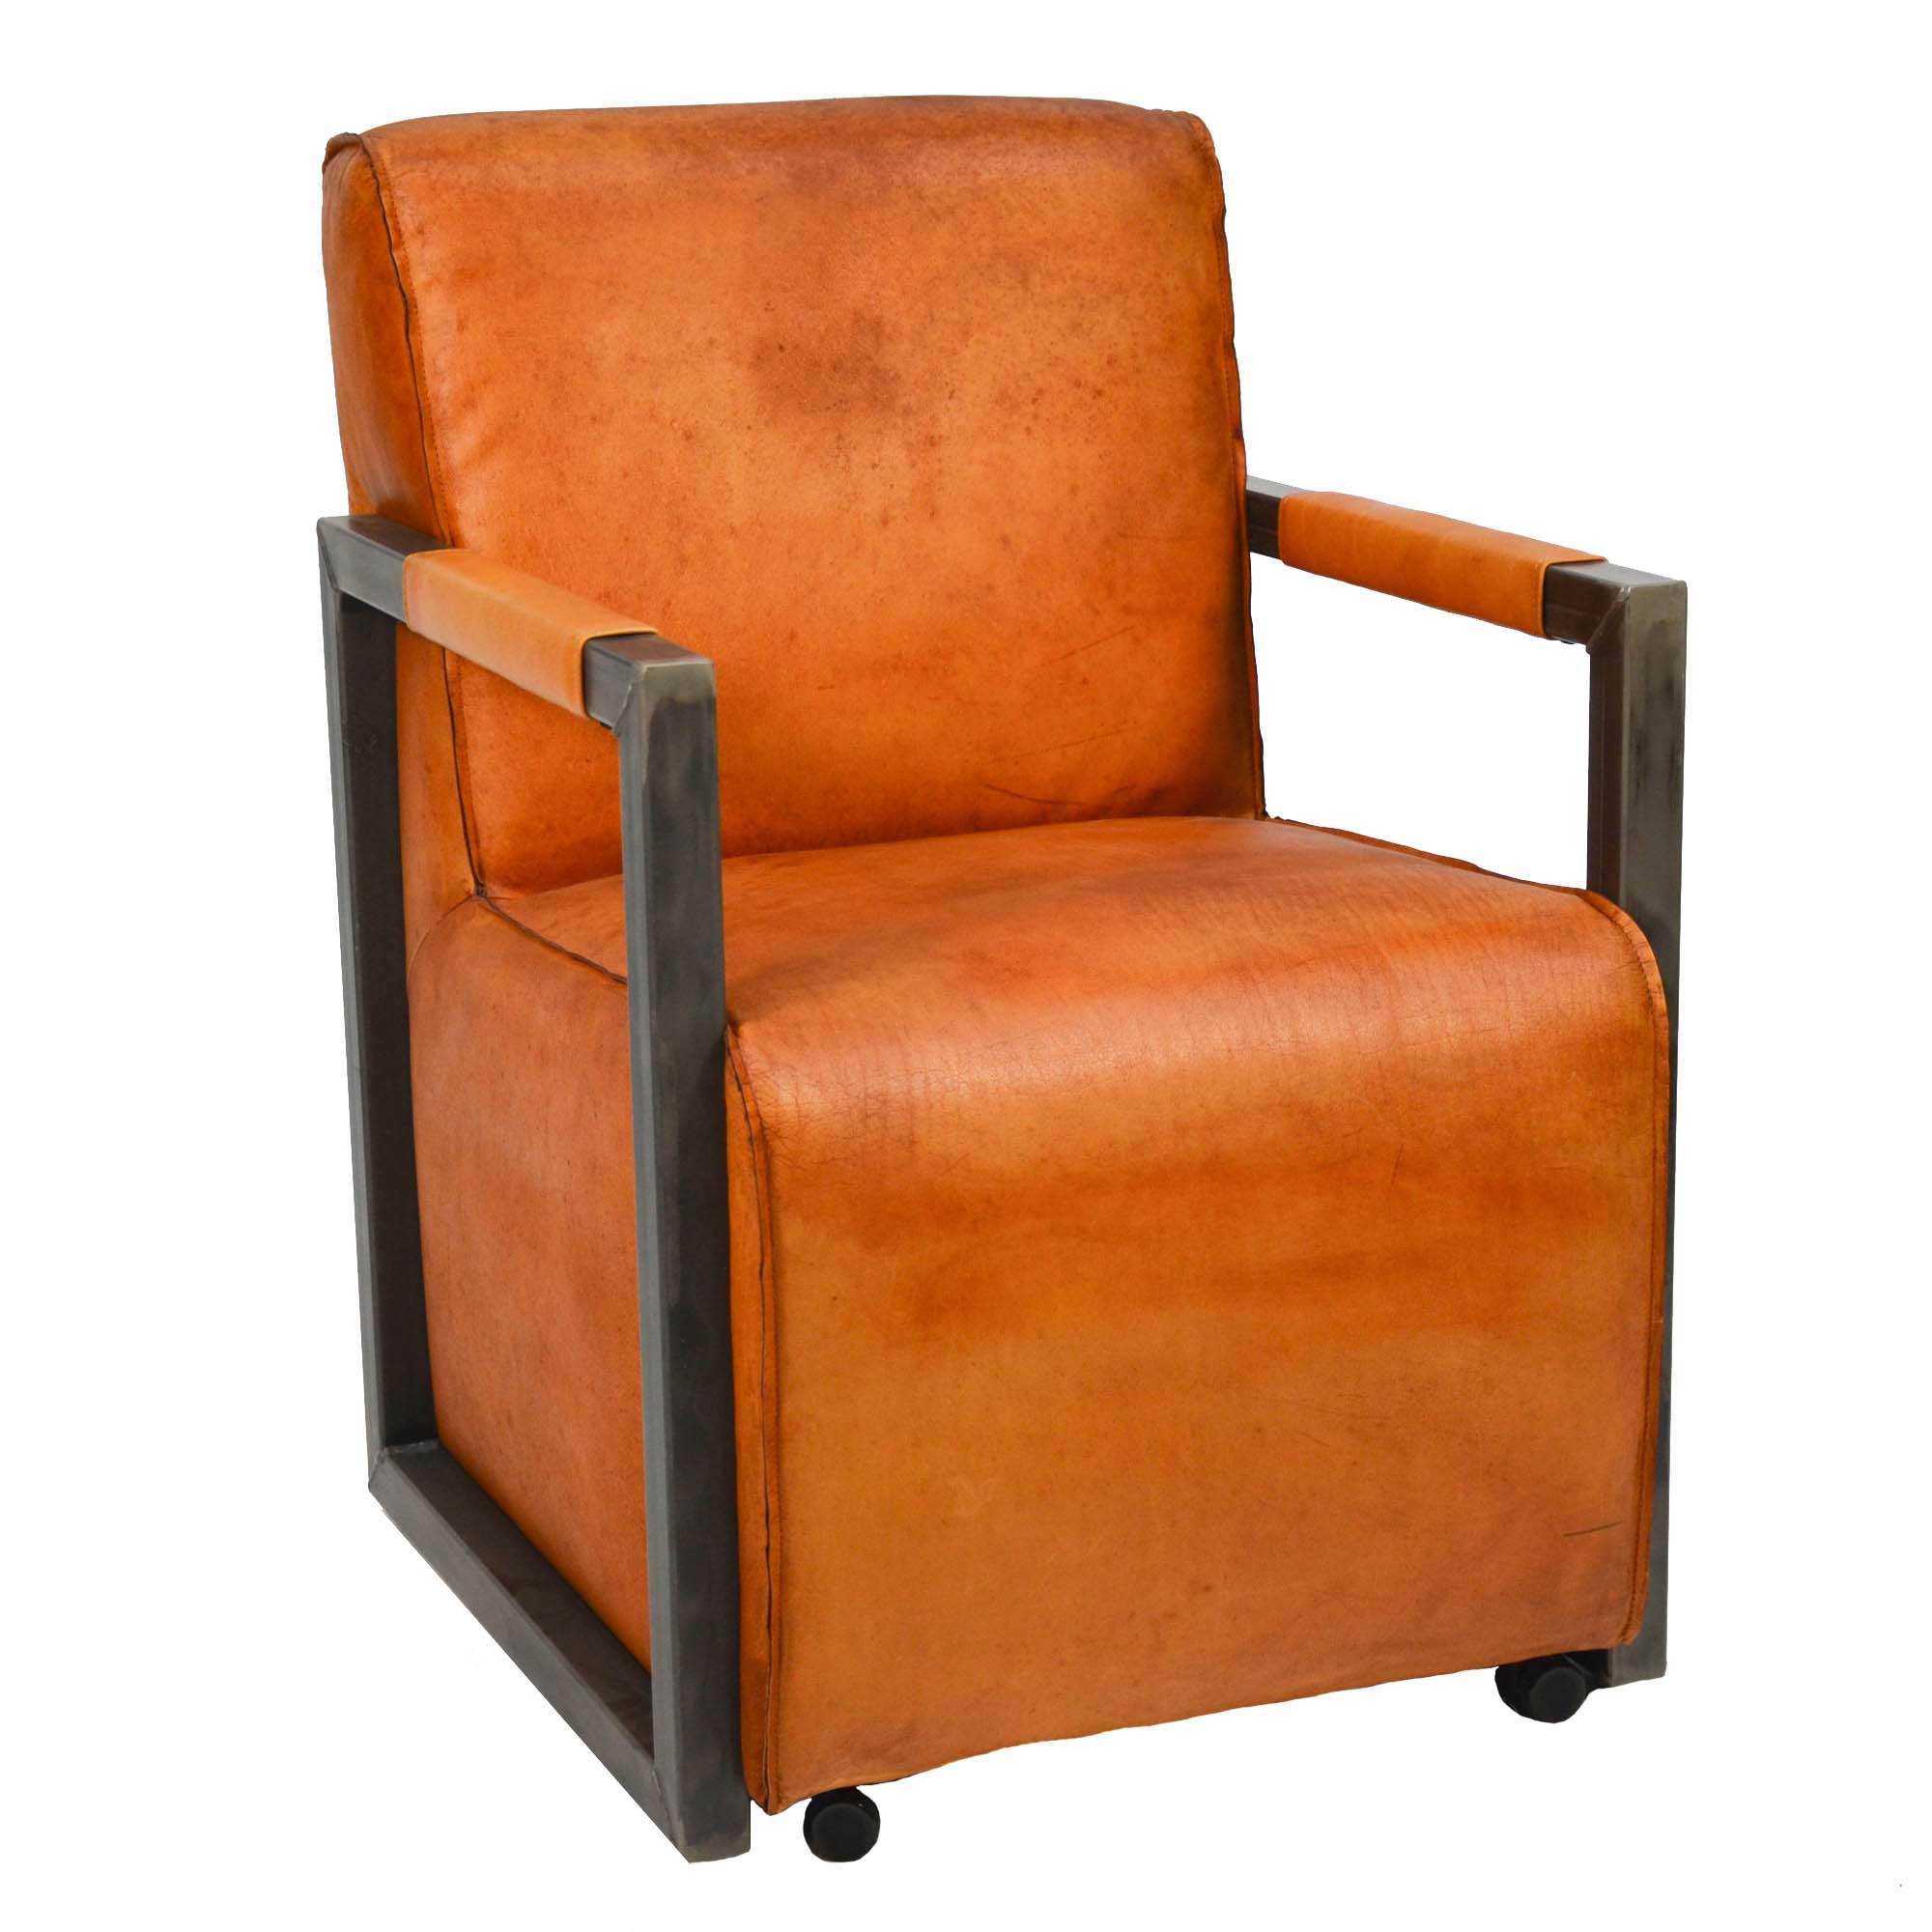 Sessel amerikanisches design williamflooring for Kopie eames chair